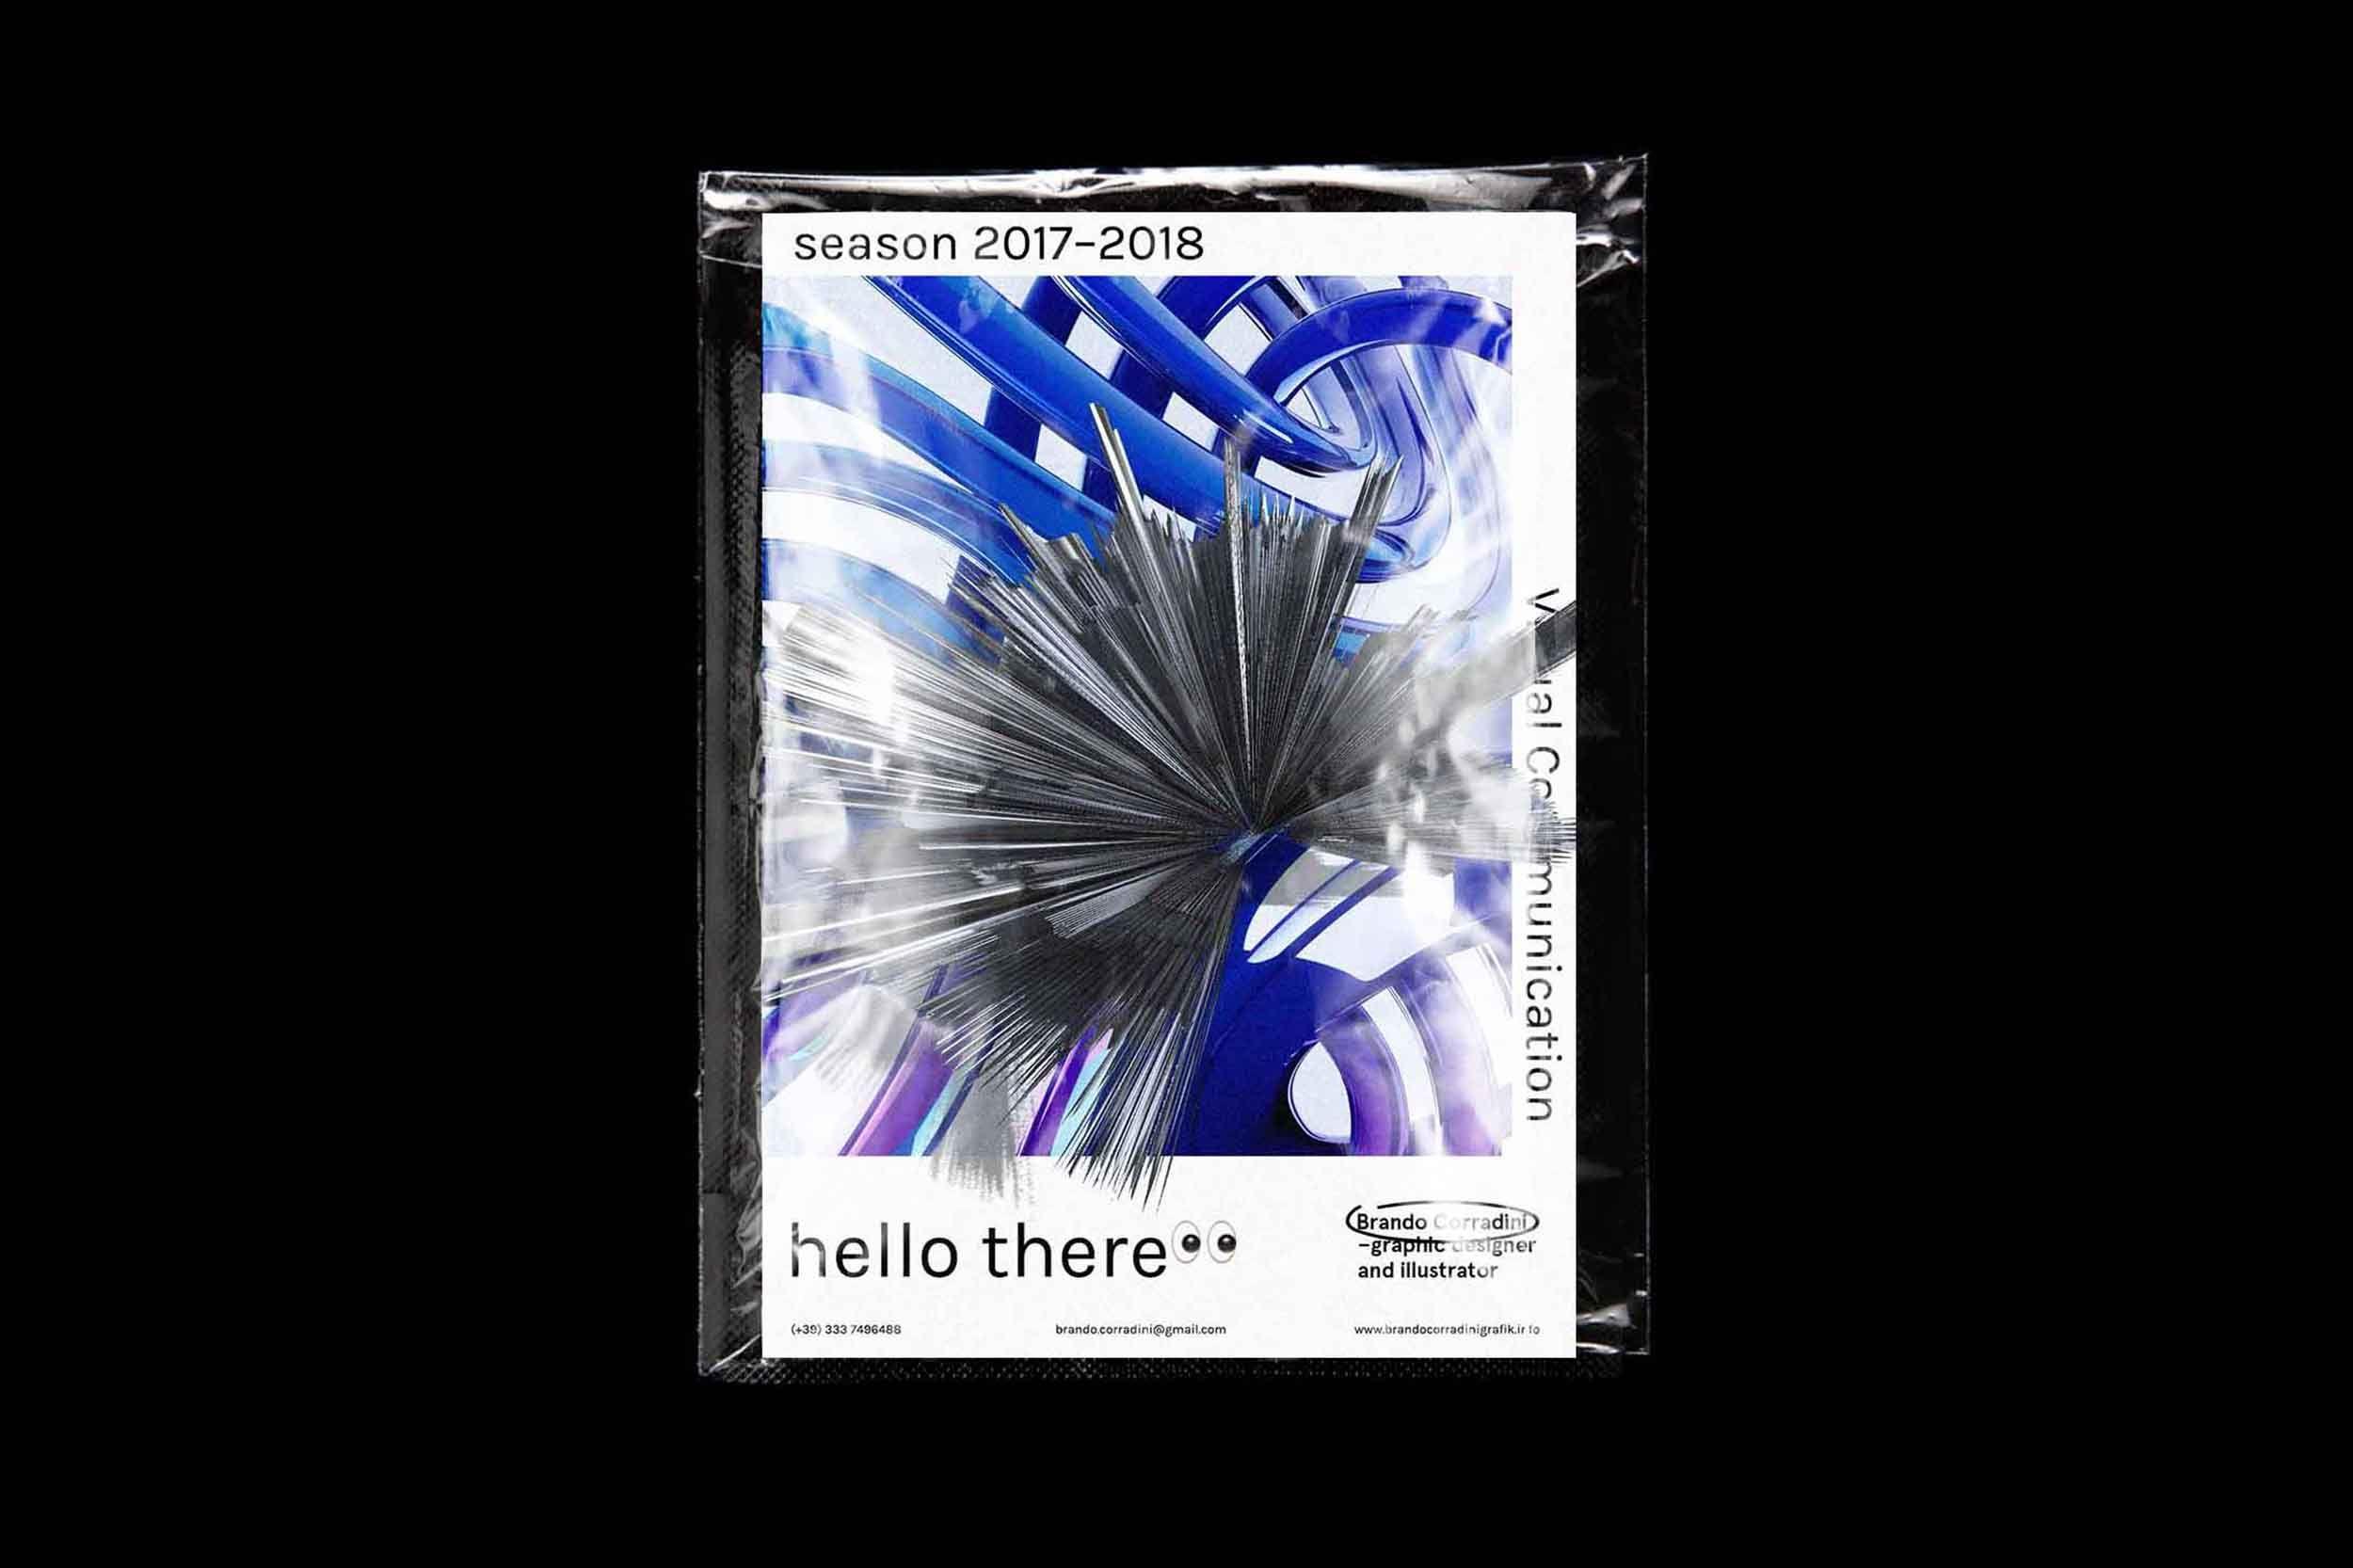 Brando Corradini - Visual Communication 2017-2018  #personalidentity #brandidentity #print #brandocorradini #grafikdesign #grafik #visual #visualcommunication #grafica #graphidesign #businesscard #black #artdirection #artdirector #portfolio #website #creative #creativity #passion #work #dailyinspiration #inspiration